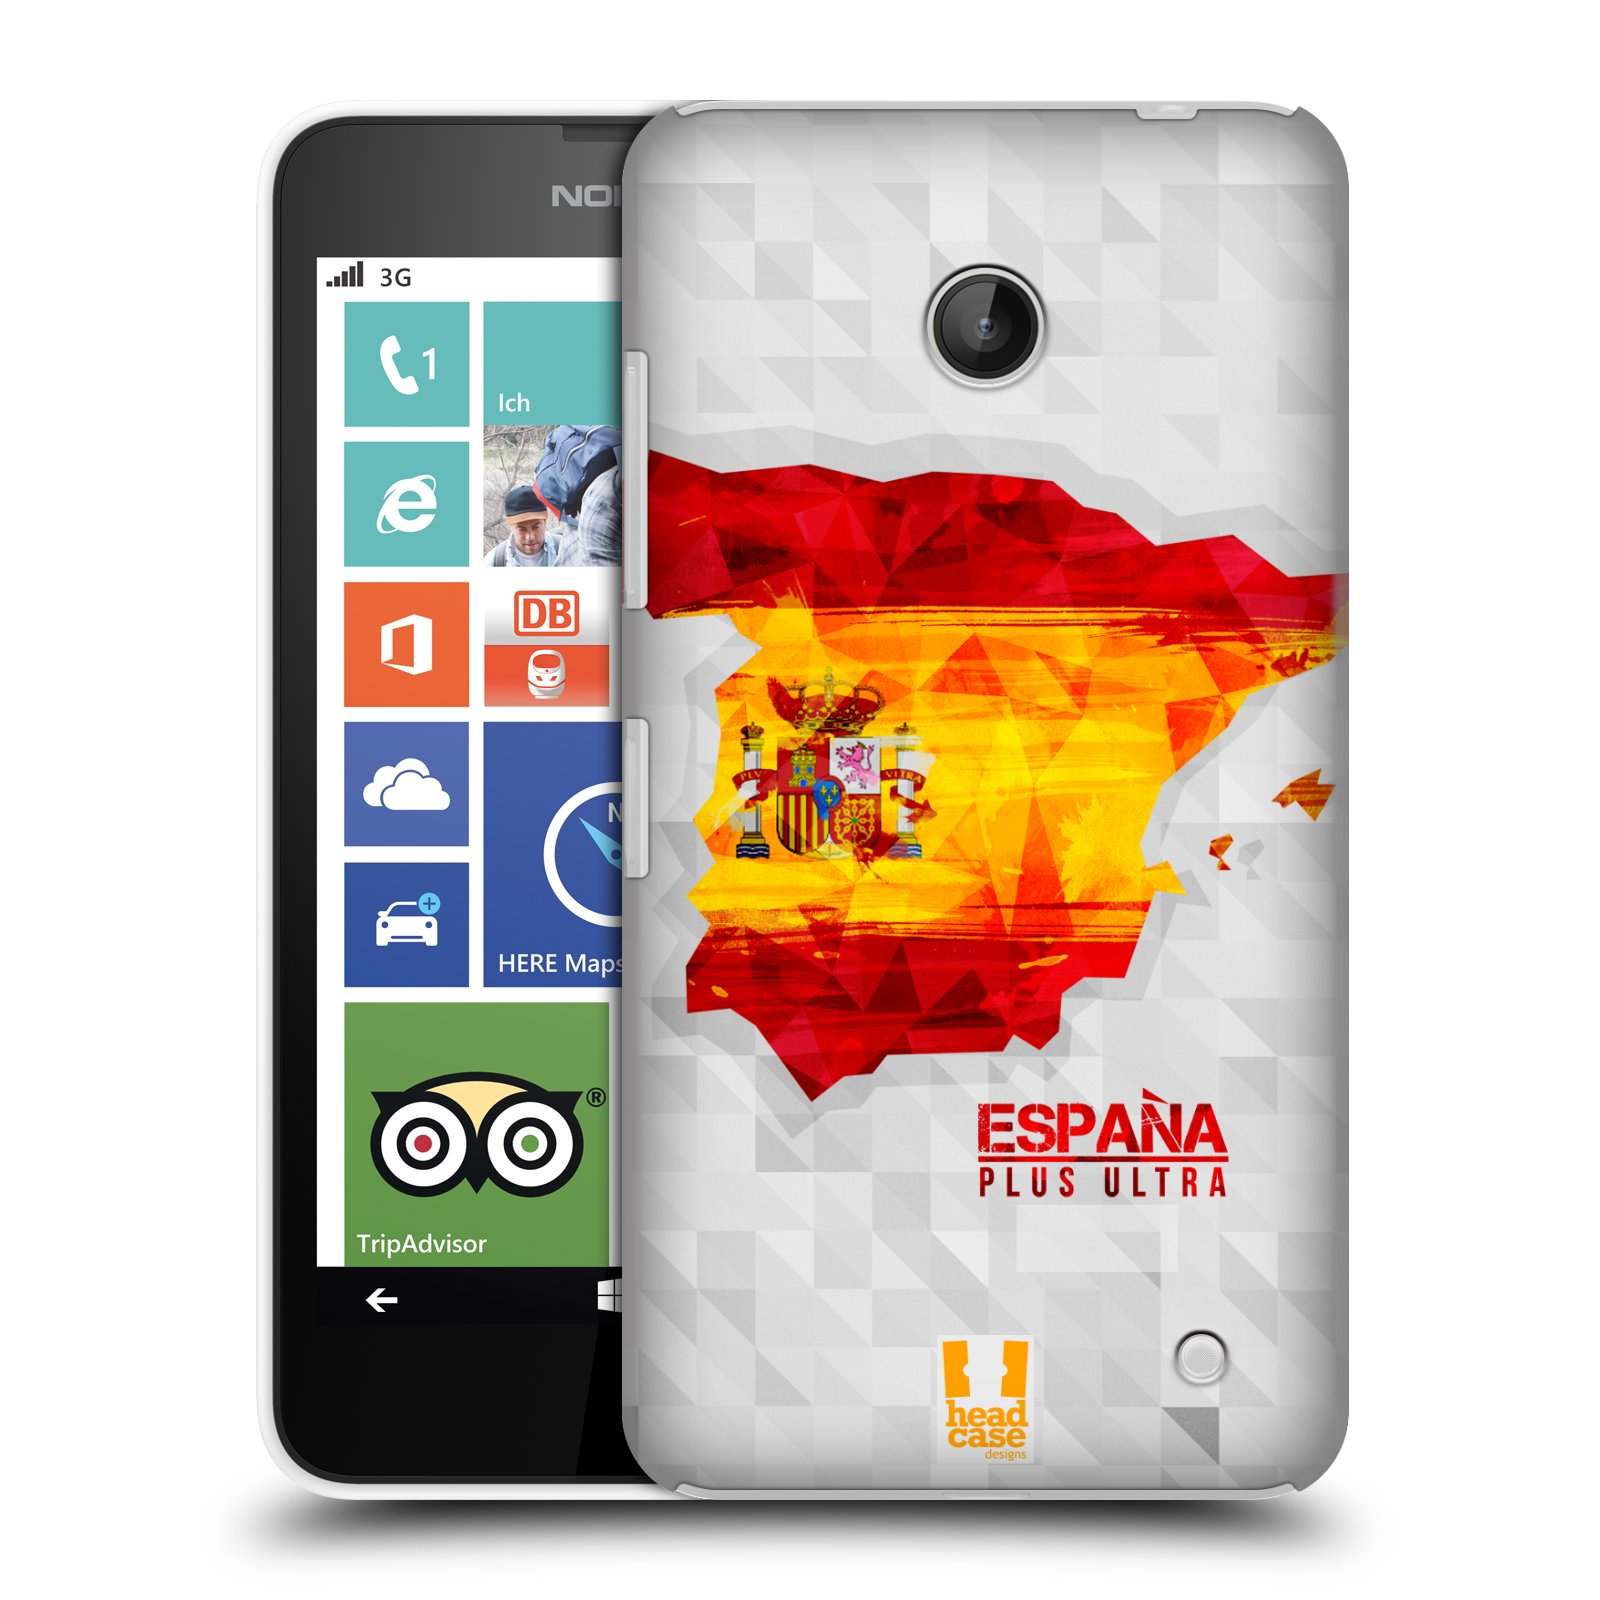 Plastové pouzdro na mobil Nokia Lumia 630 HEAD CASE GEOMAPA ŠPANĚLSKO (Kryt či obal na mobilní telefon Nokia Lumia 630 a Nokia Lumia 630 Dual SIM)